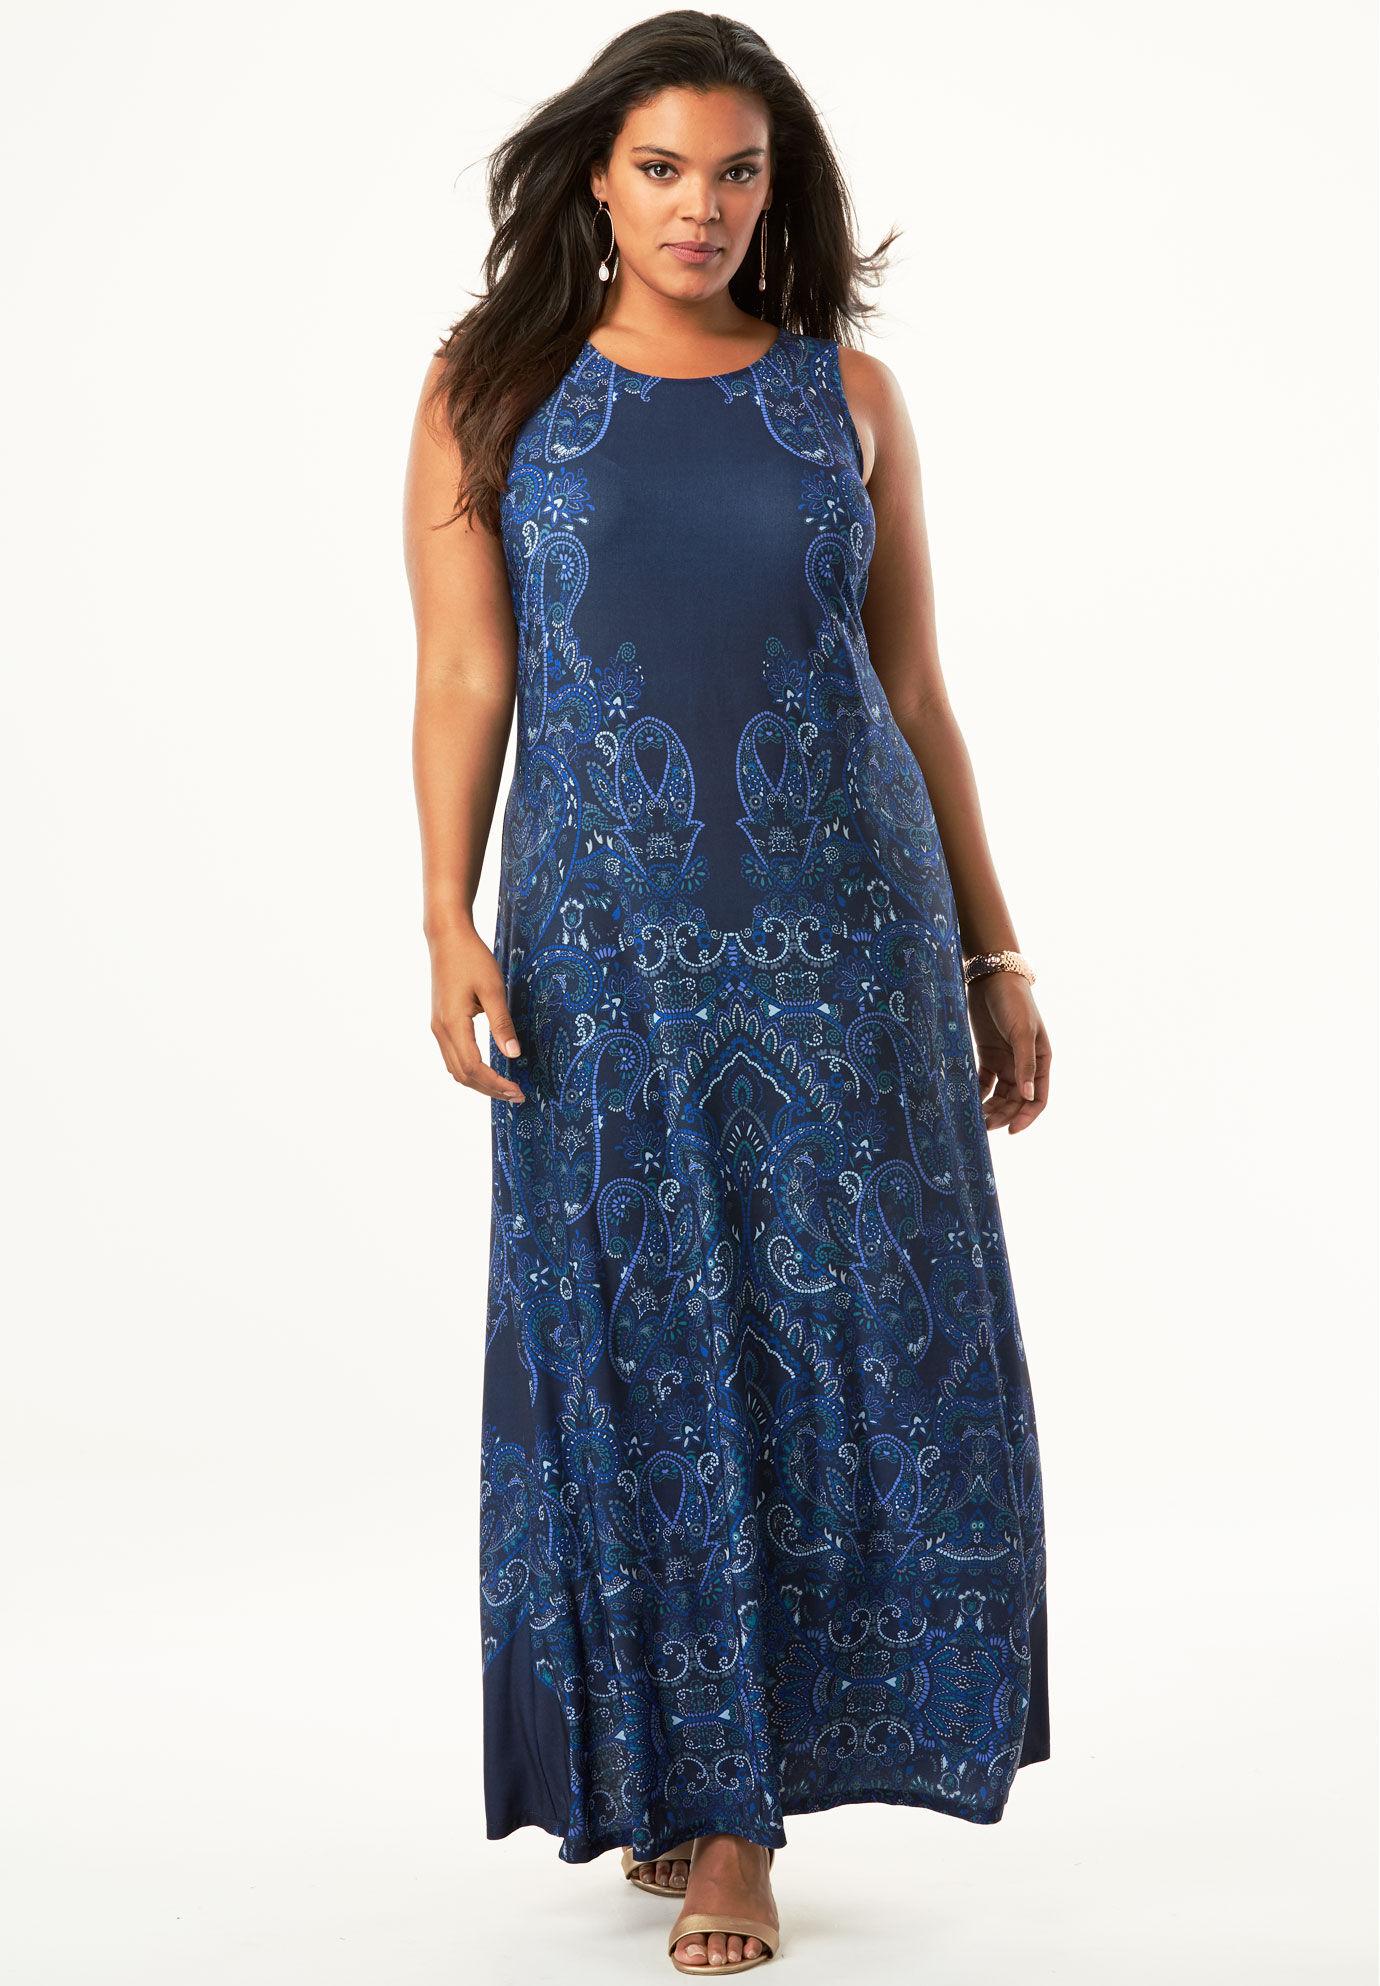 Blue Black Women's Plus Size Maxi Dress